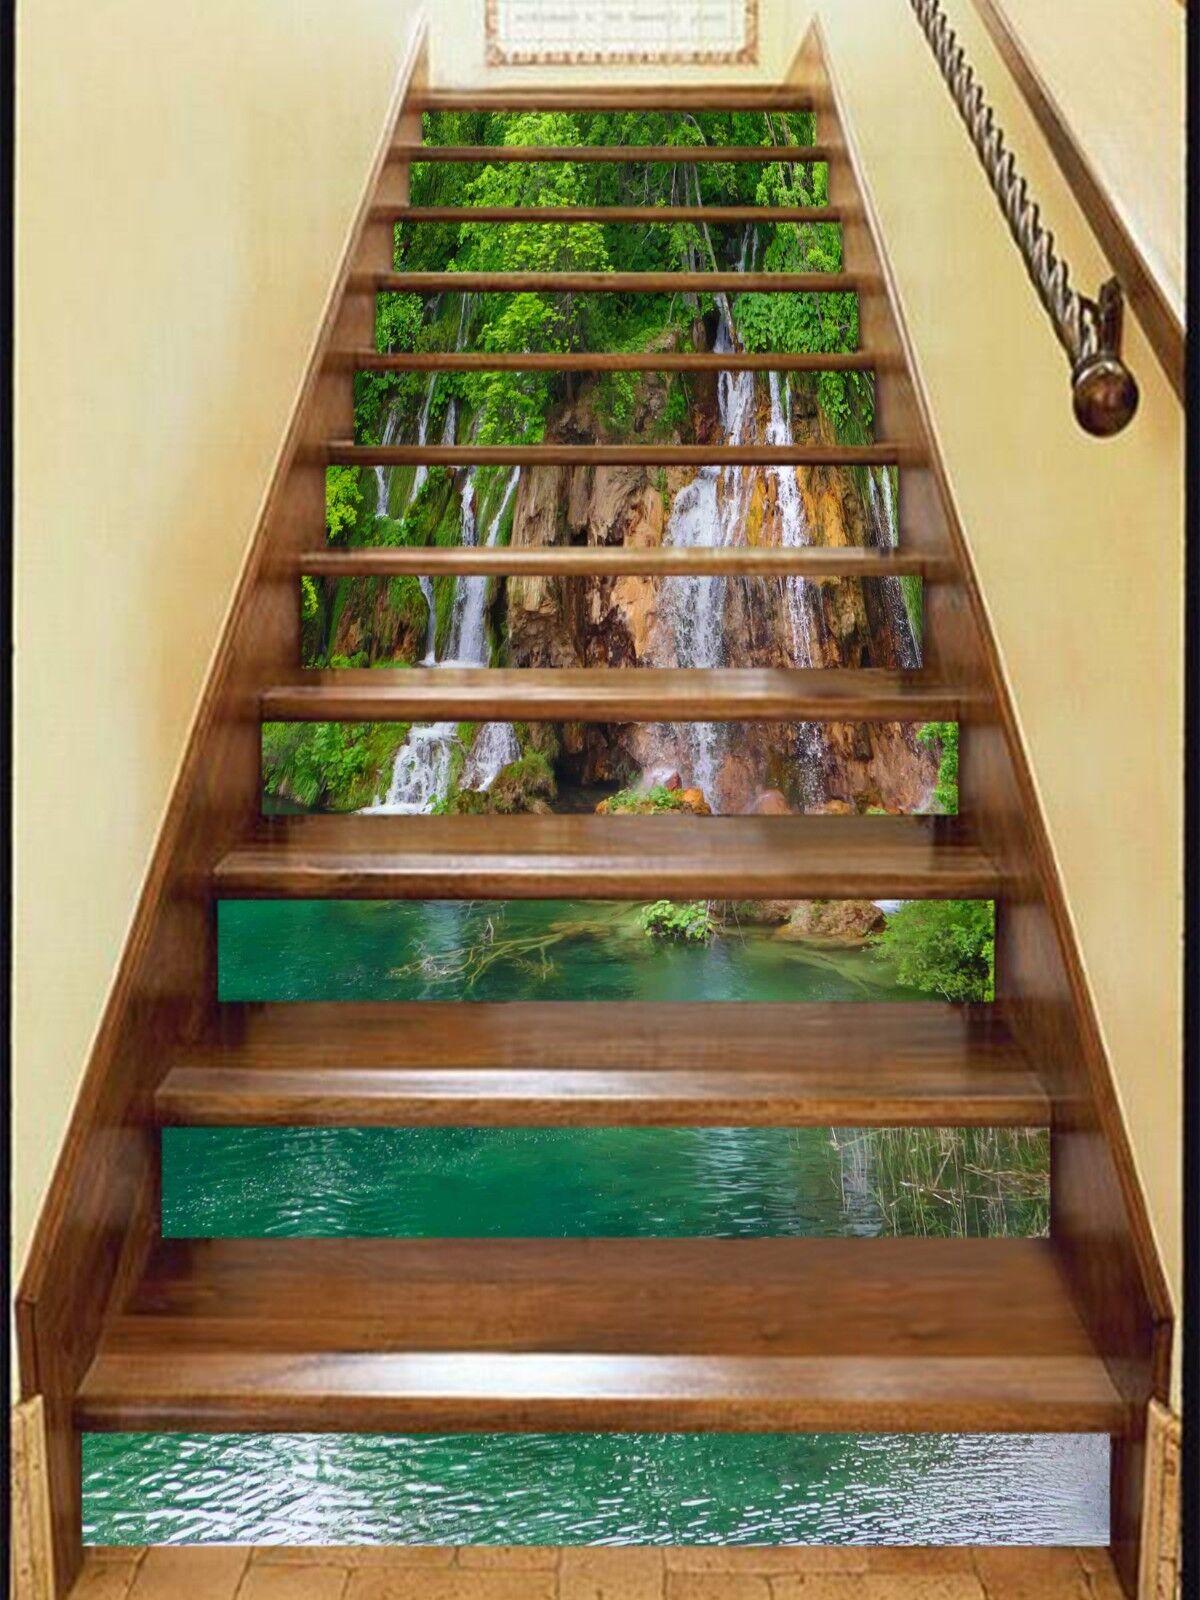 3D Lake Waterfall 3 Stair Risers Decoration Photo Mural Vinyl Decal WandPapier UK